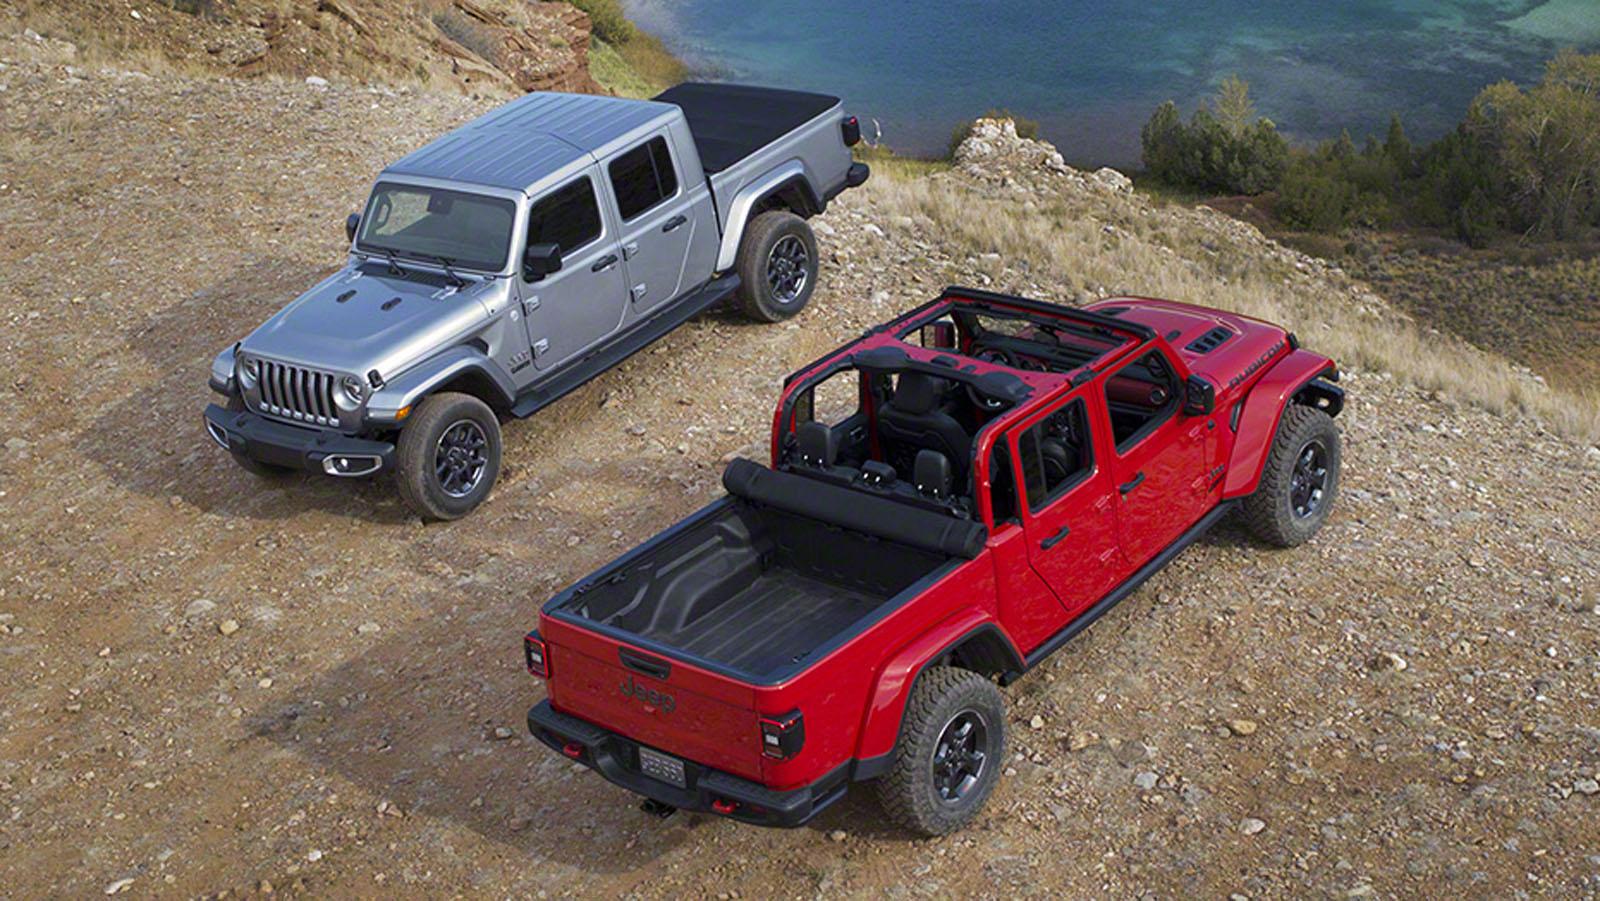 2020 Jeep Gladiator Pricing Info Revealed